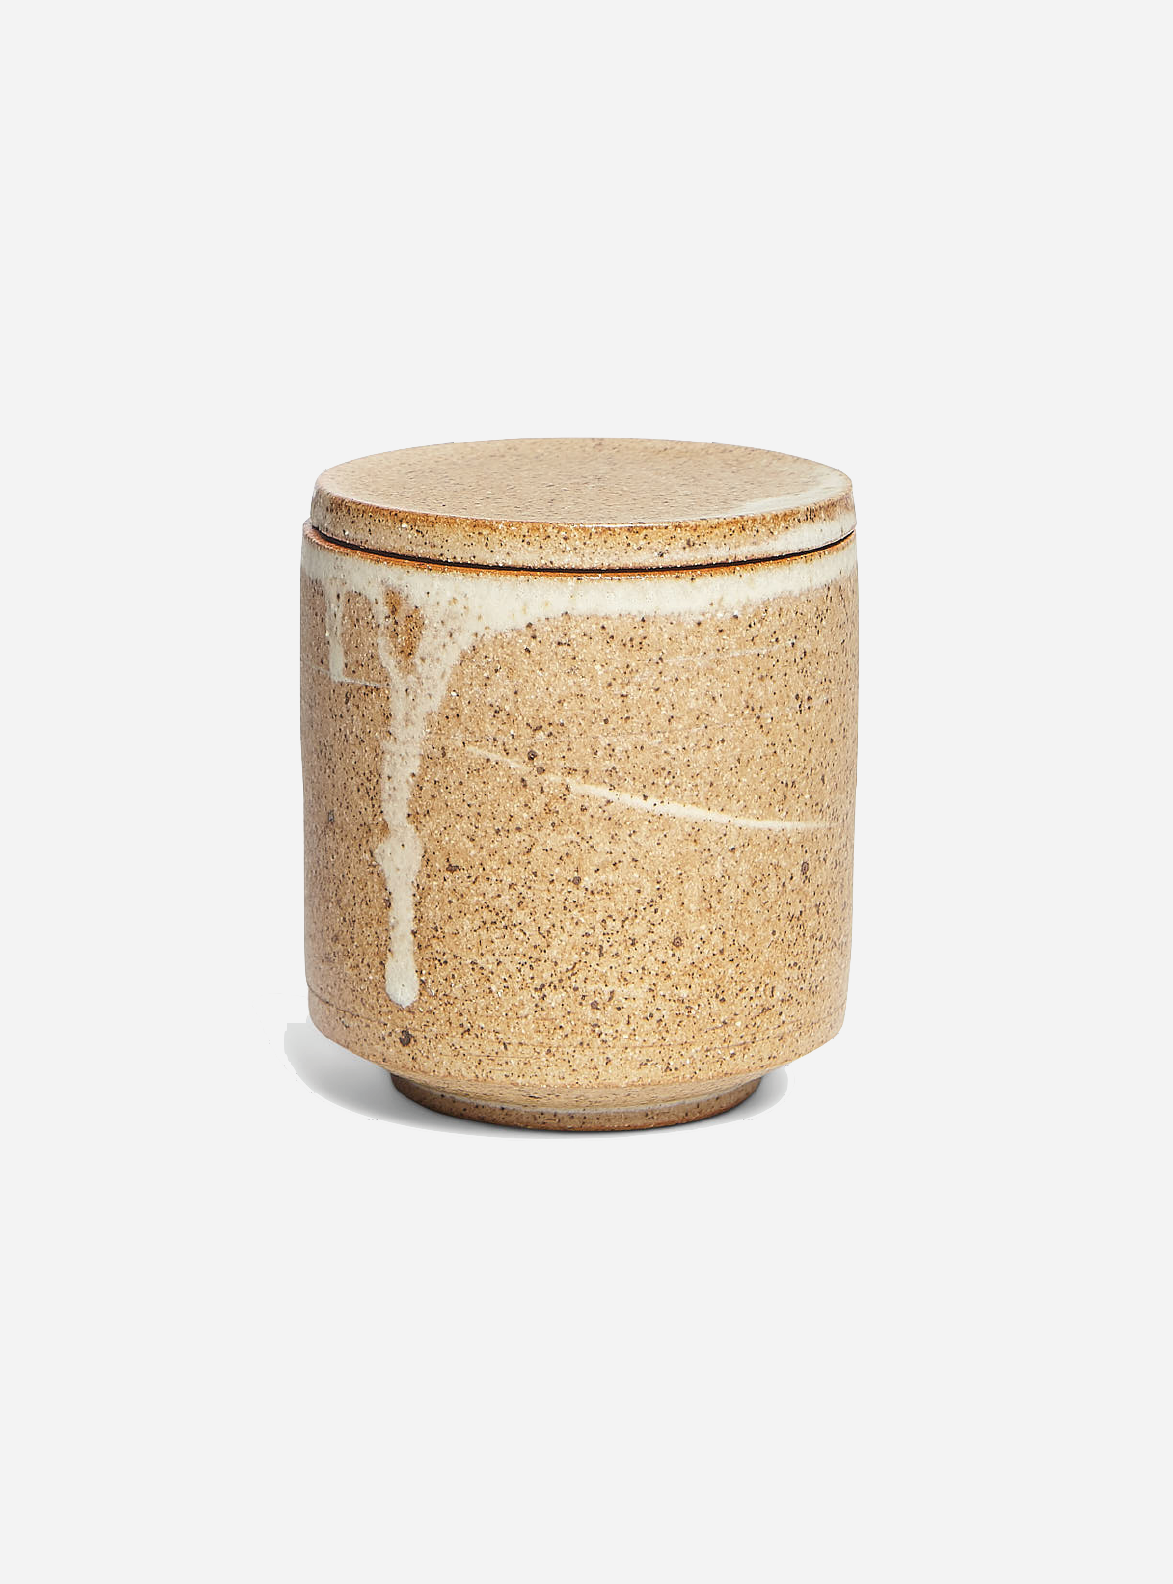 Ceramic Shinrin-Yoku_1 copy